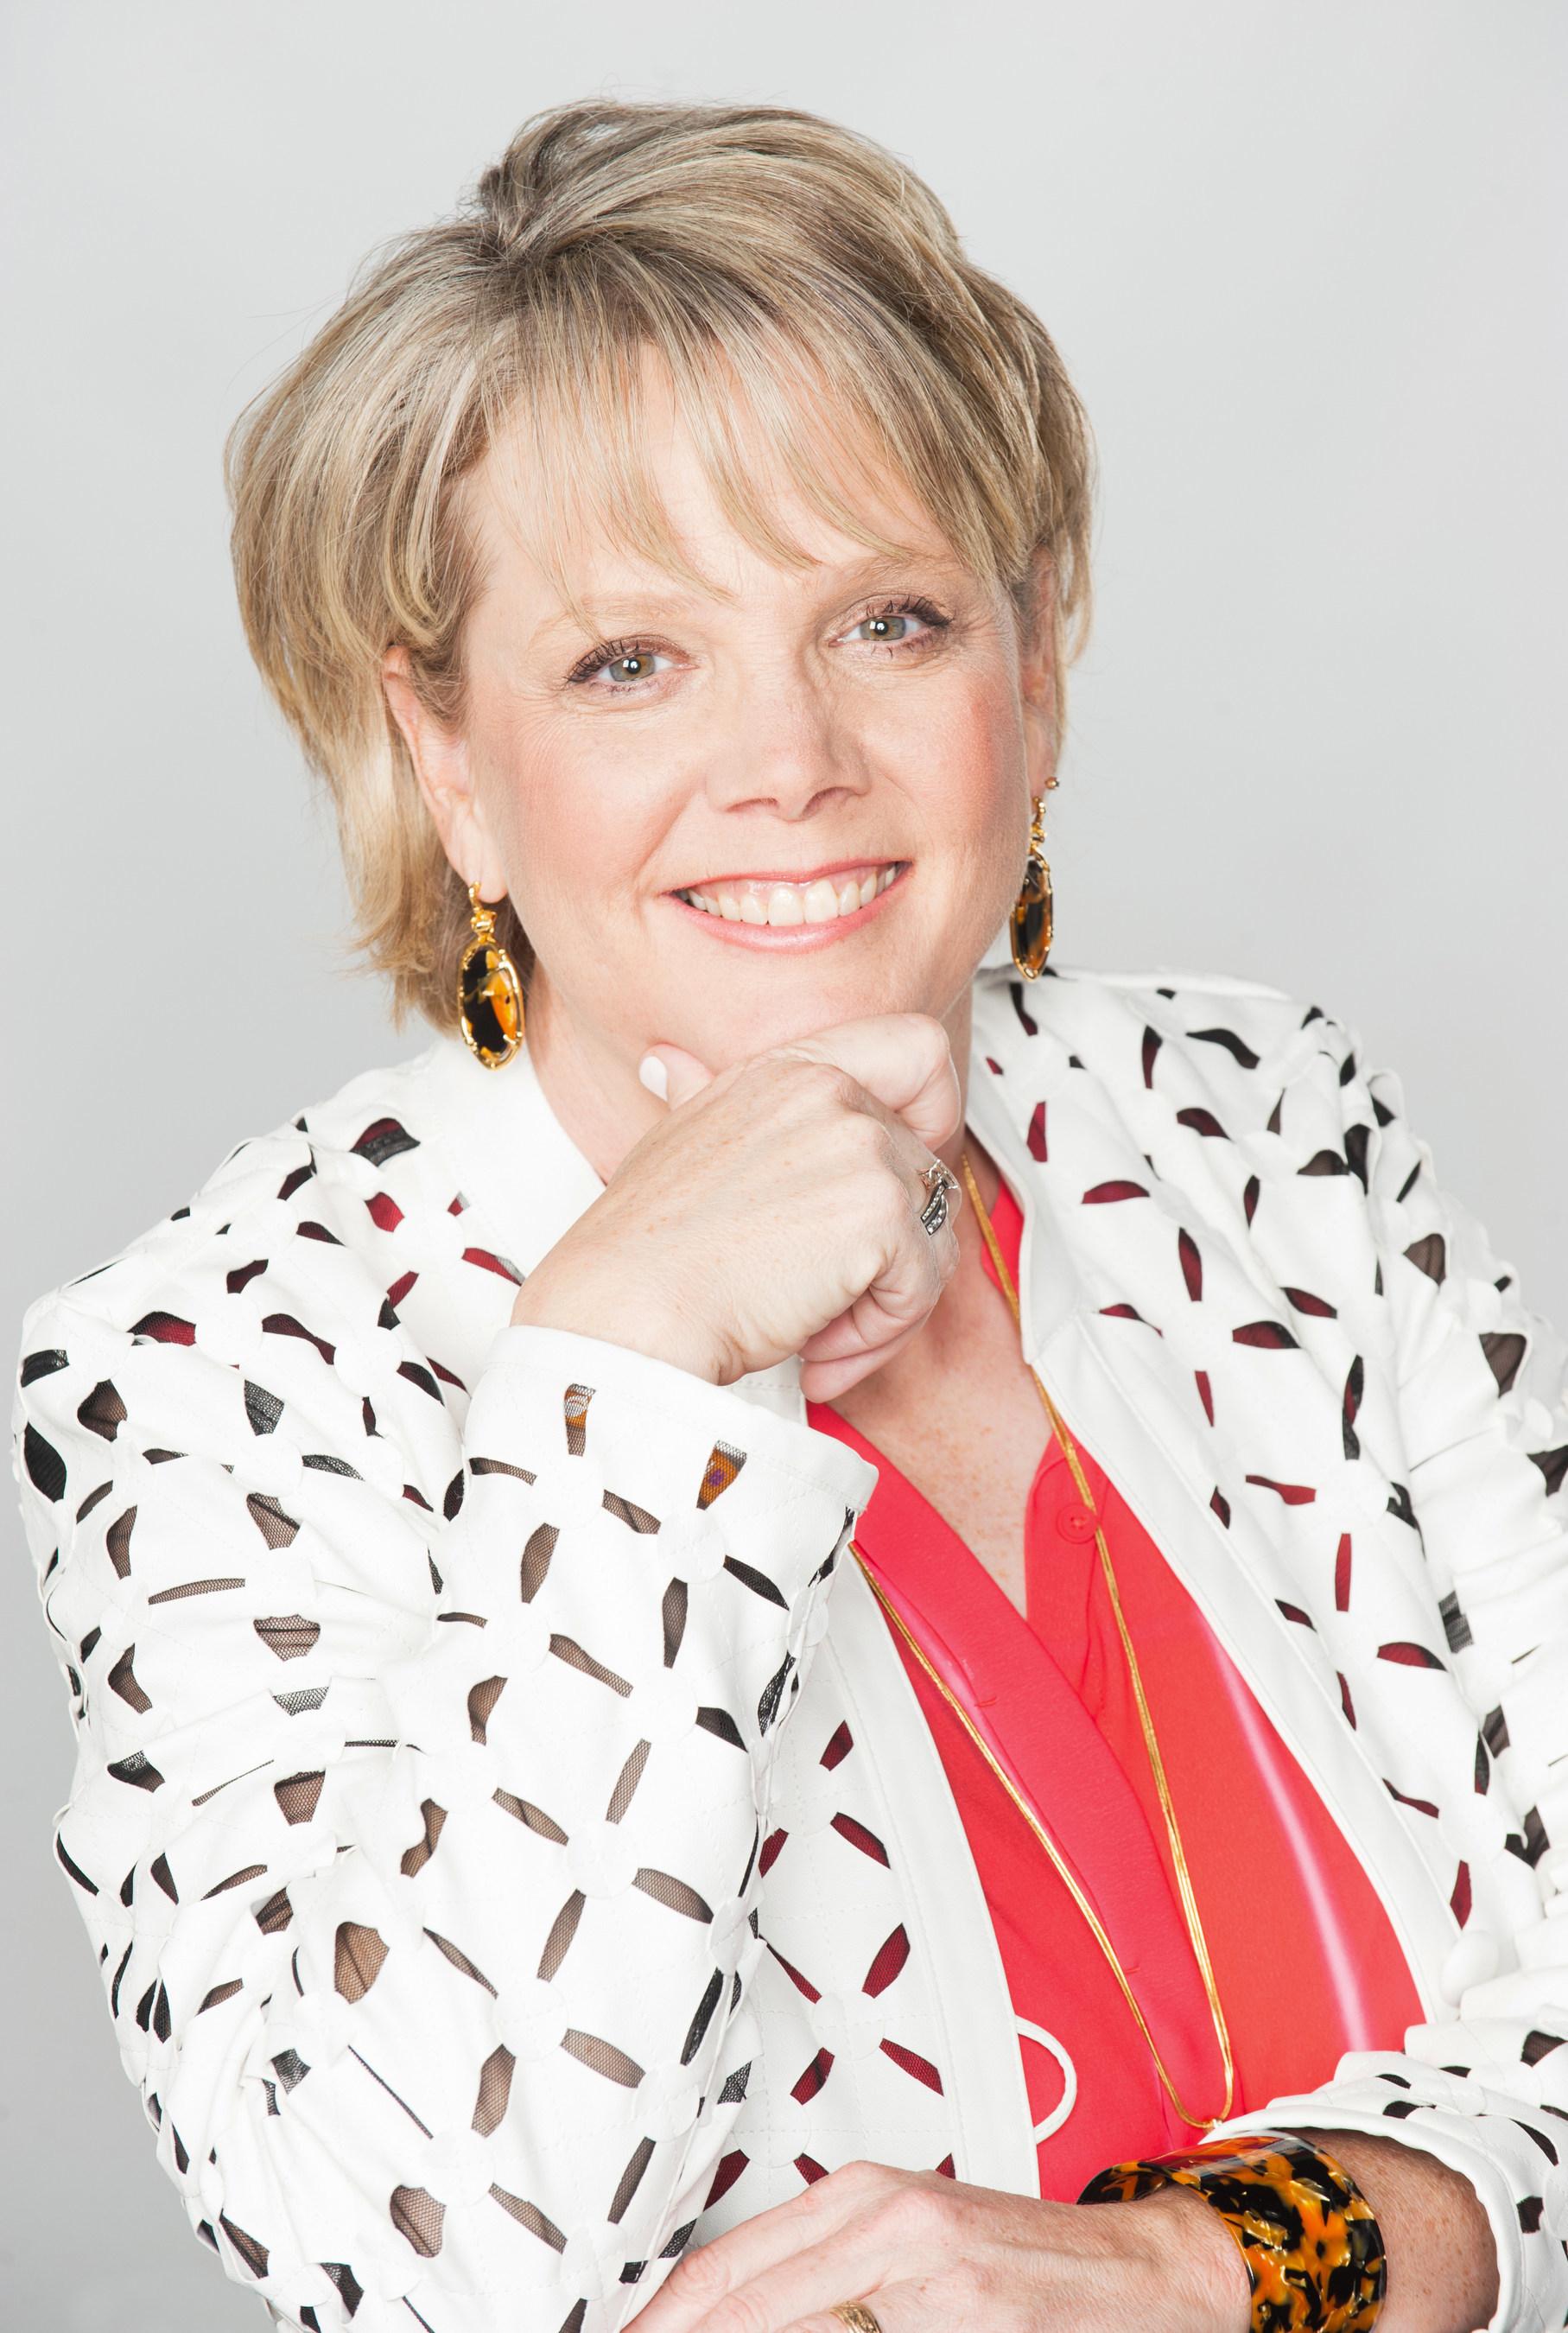 Nerium International Names Deborah K. Heisz President and COO